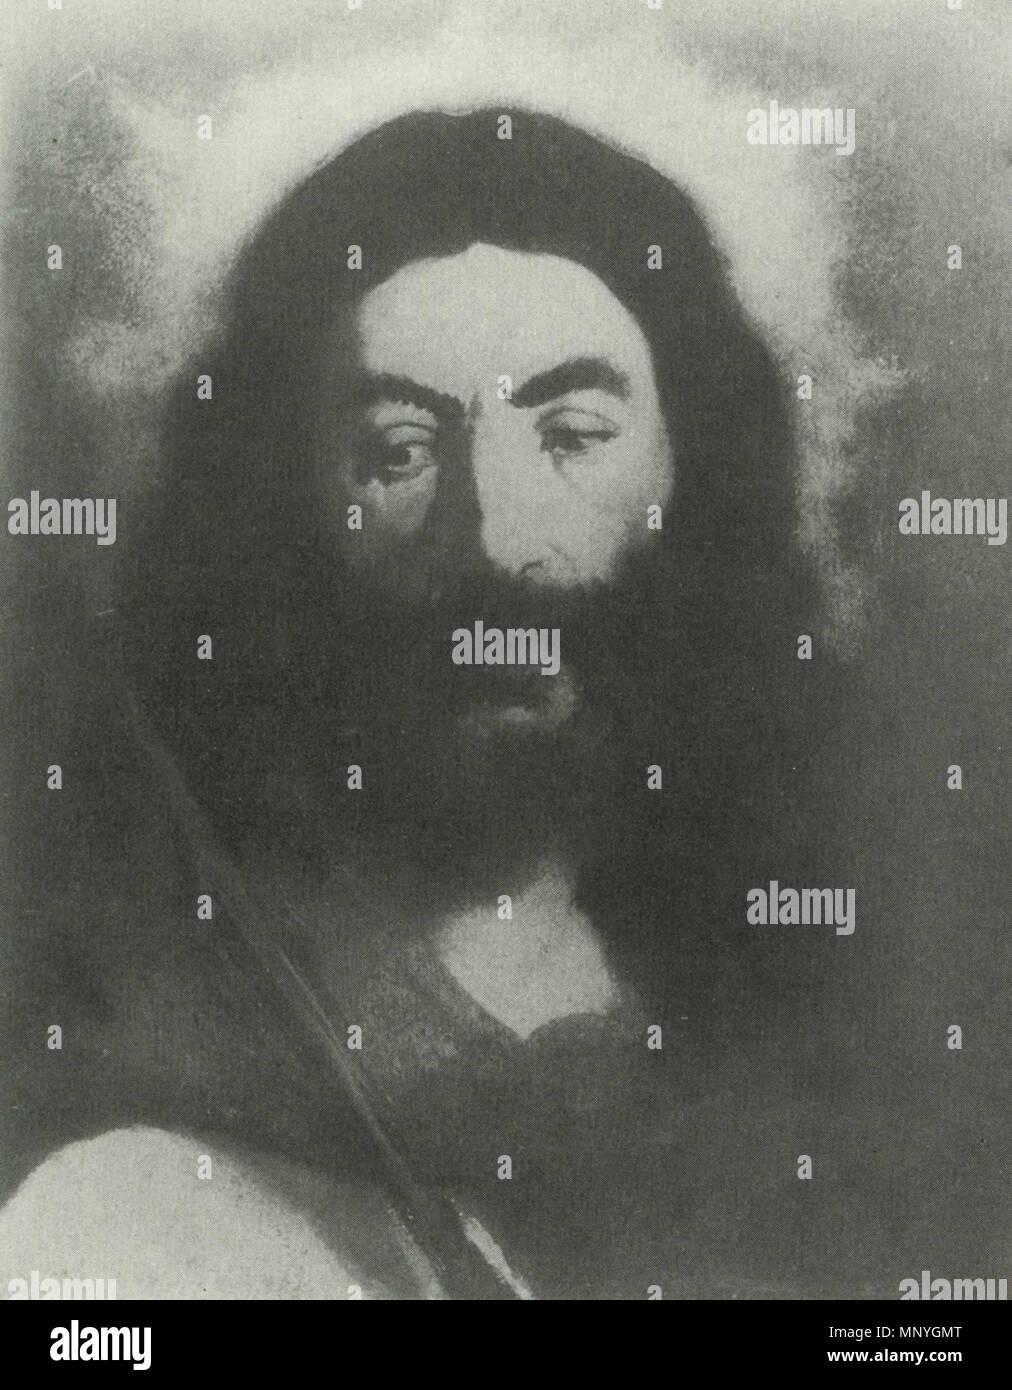 1288 Édouard Manet - Christ au rosseau (RW 13) - Stock Image